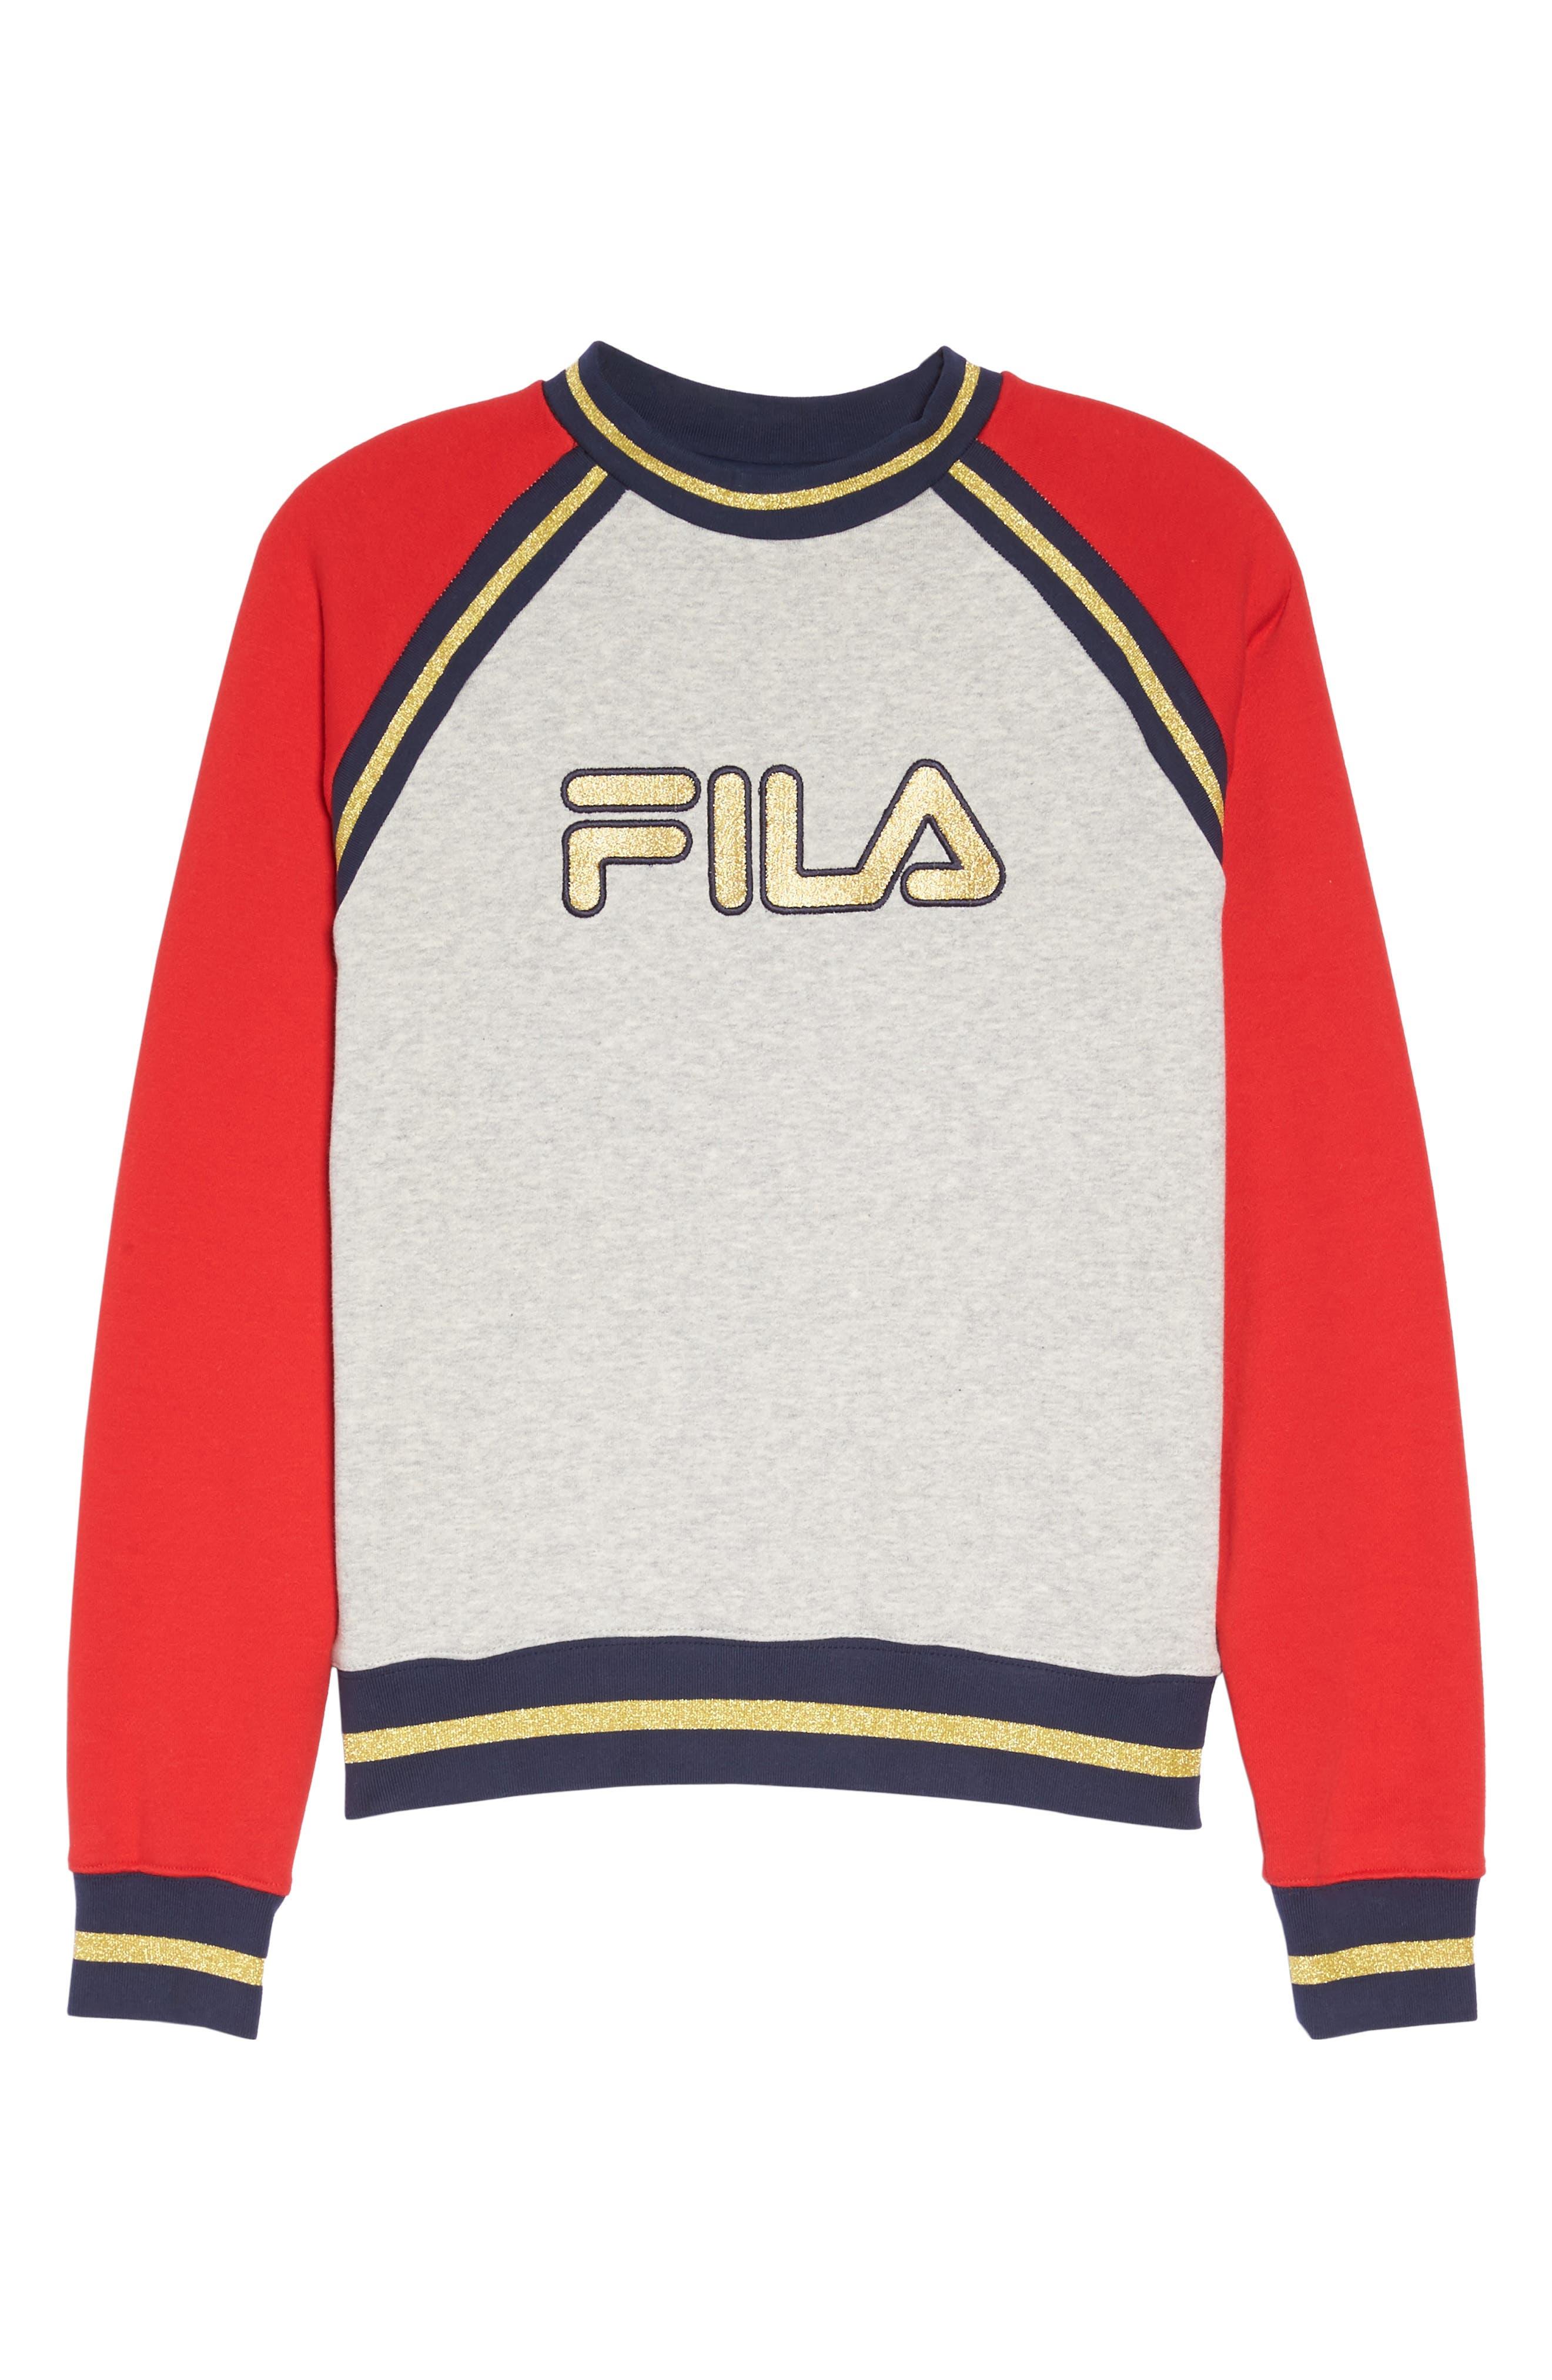 Rafaella Sweatshirt,                             Alternate thumbnail 7, color,                             Light Grey / Peacoat/ Red